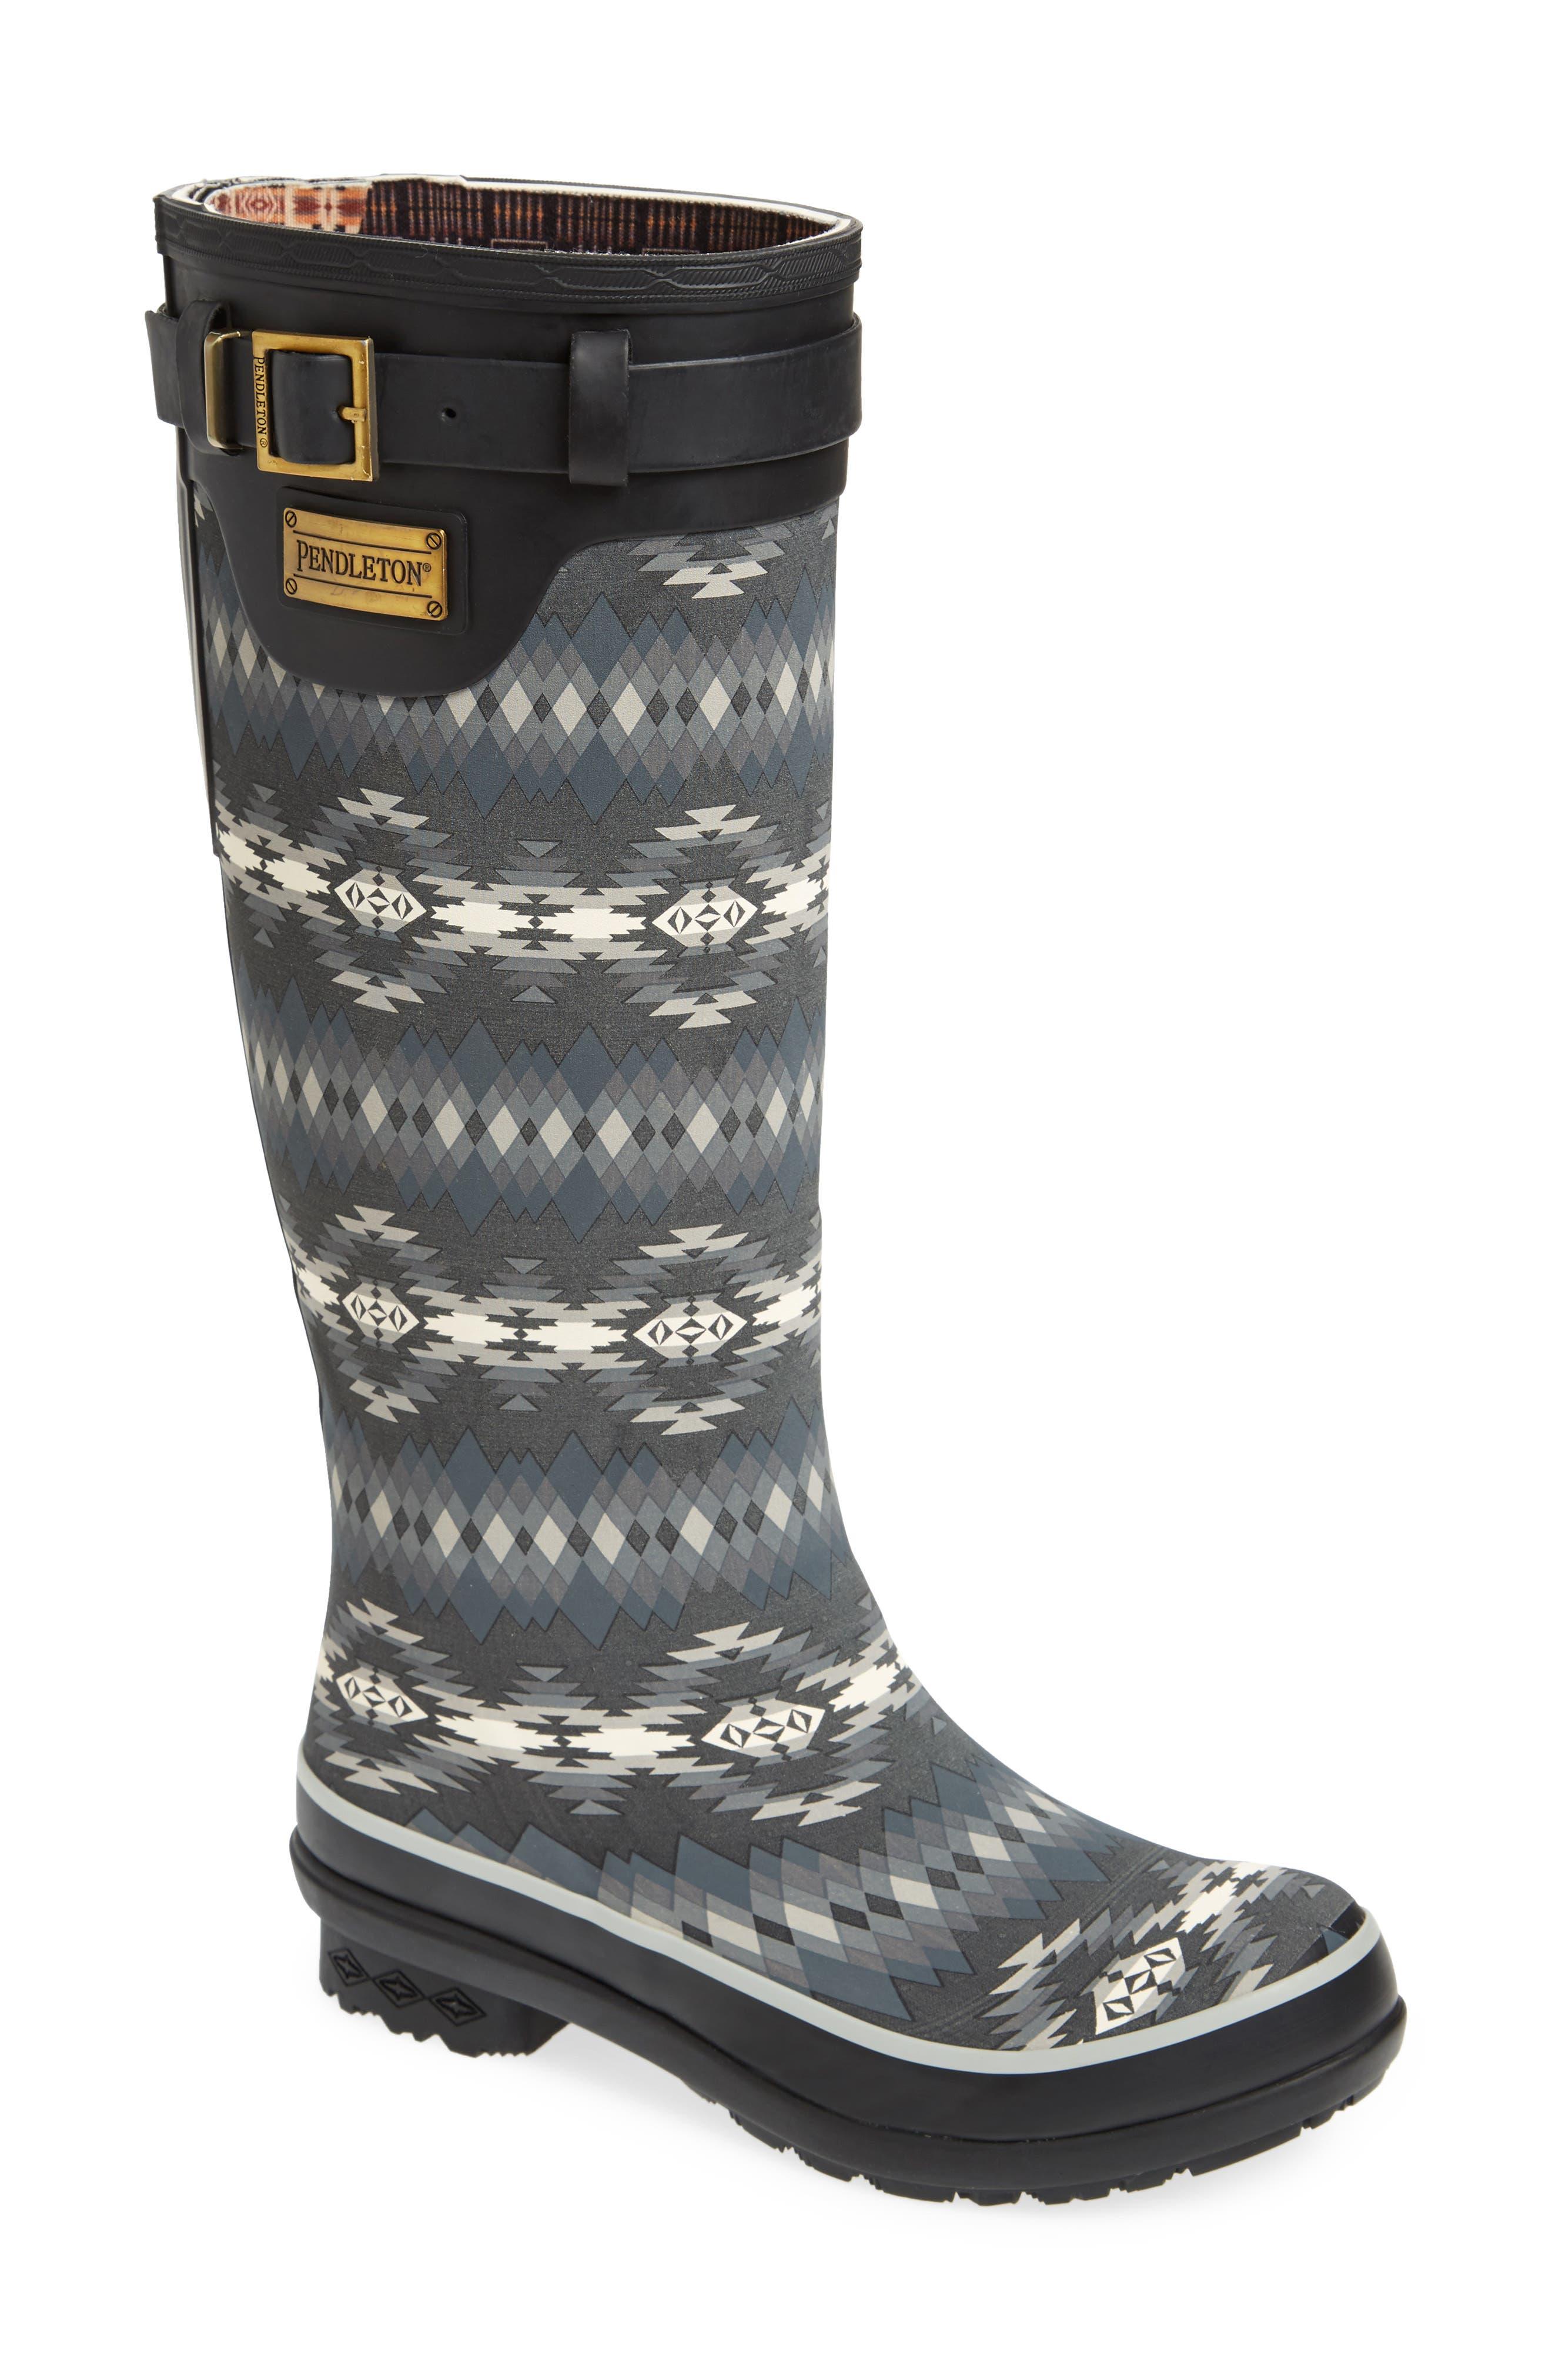 Alternate Image 1 Selected - Pendleton Papago Park Tall Rain Boot (Women)